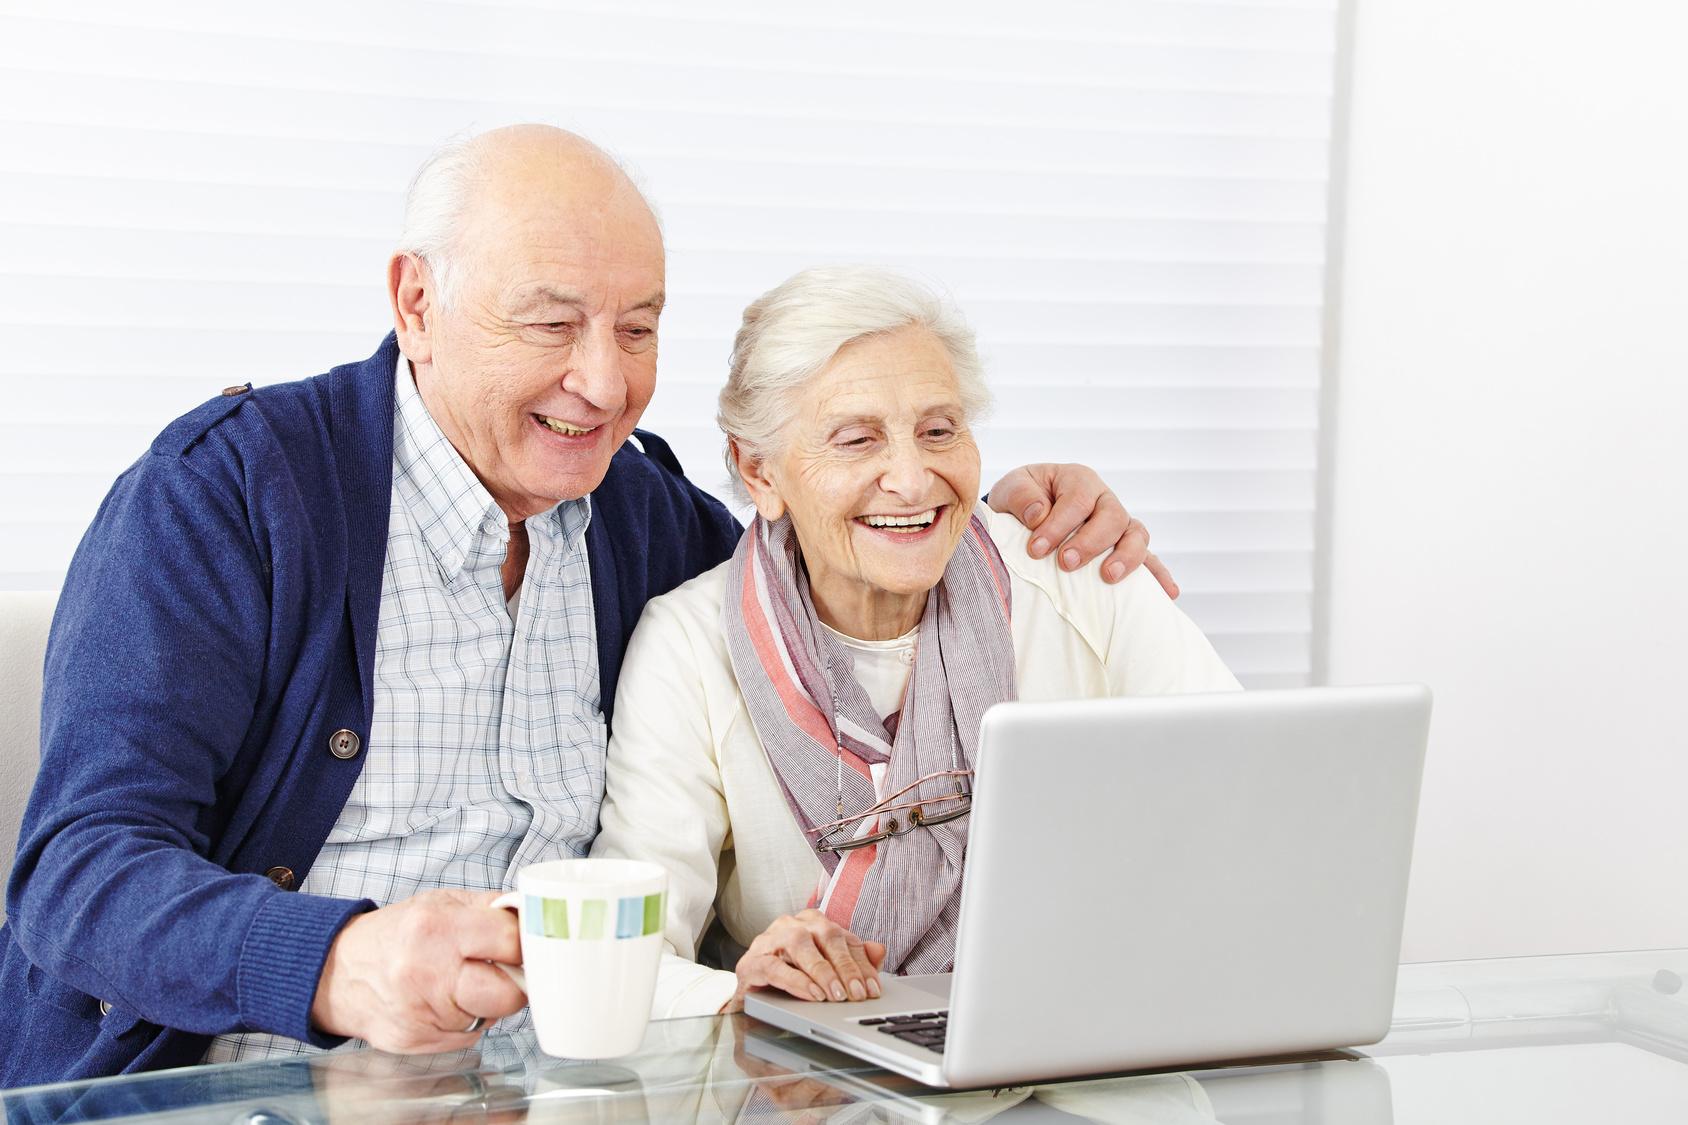 Paar Senioren surft am Computer im Internet